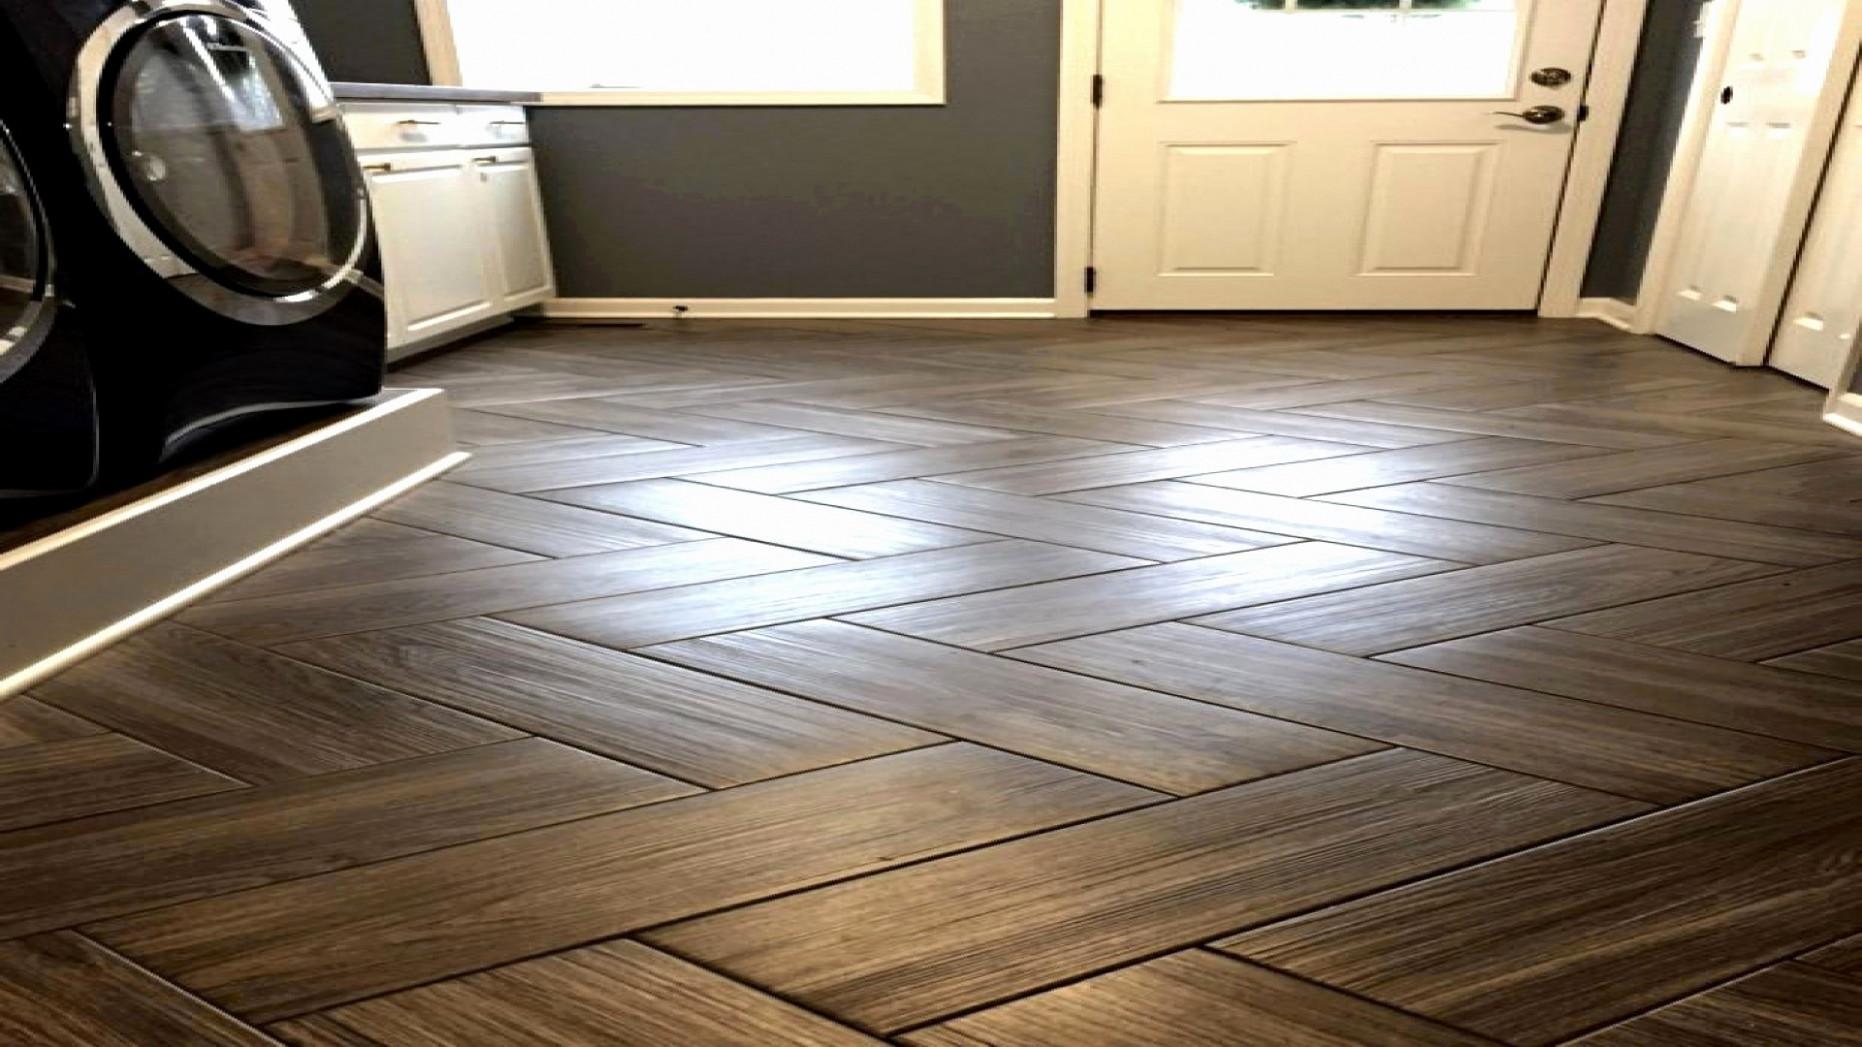 hardwood floor adhesive home depot of vinyl flooring planks bramblesdinnerhouse with hardwood flooring for sale best 52 luxury wood flooring sale 52 s graph